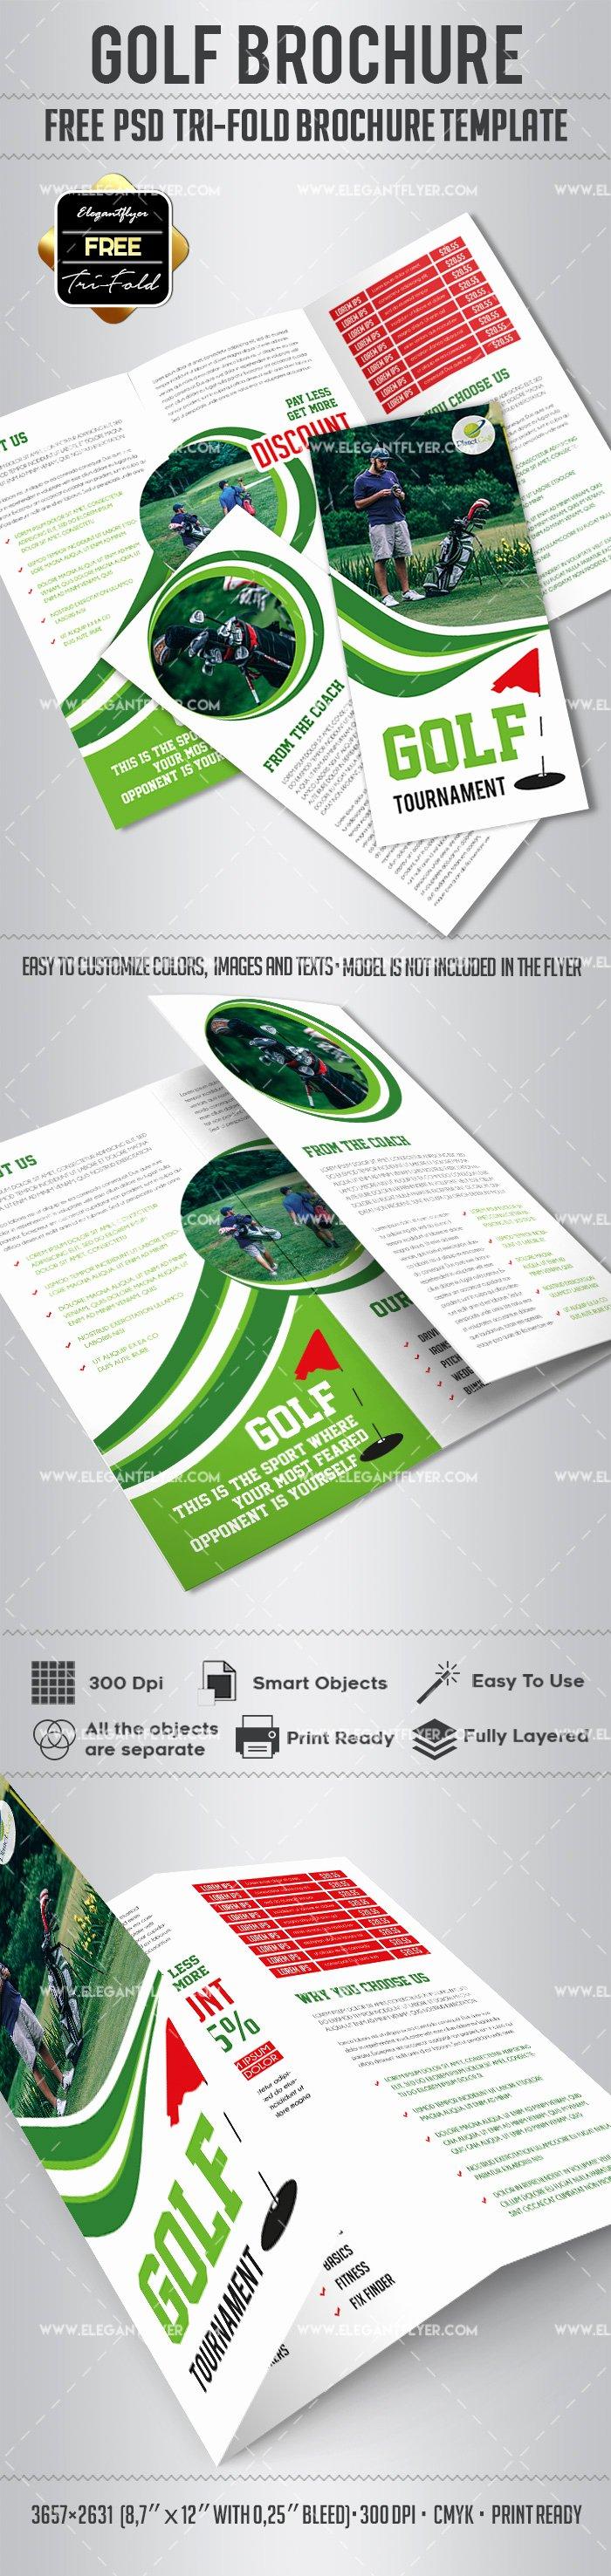 Tri Fold Brochure Template Psd Beautiful Golf – Free Psd Tri Fold Psd Brochure Template – by Elegantflyer